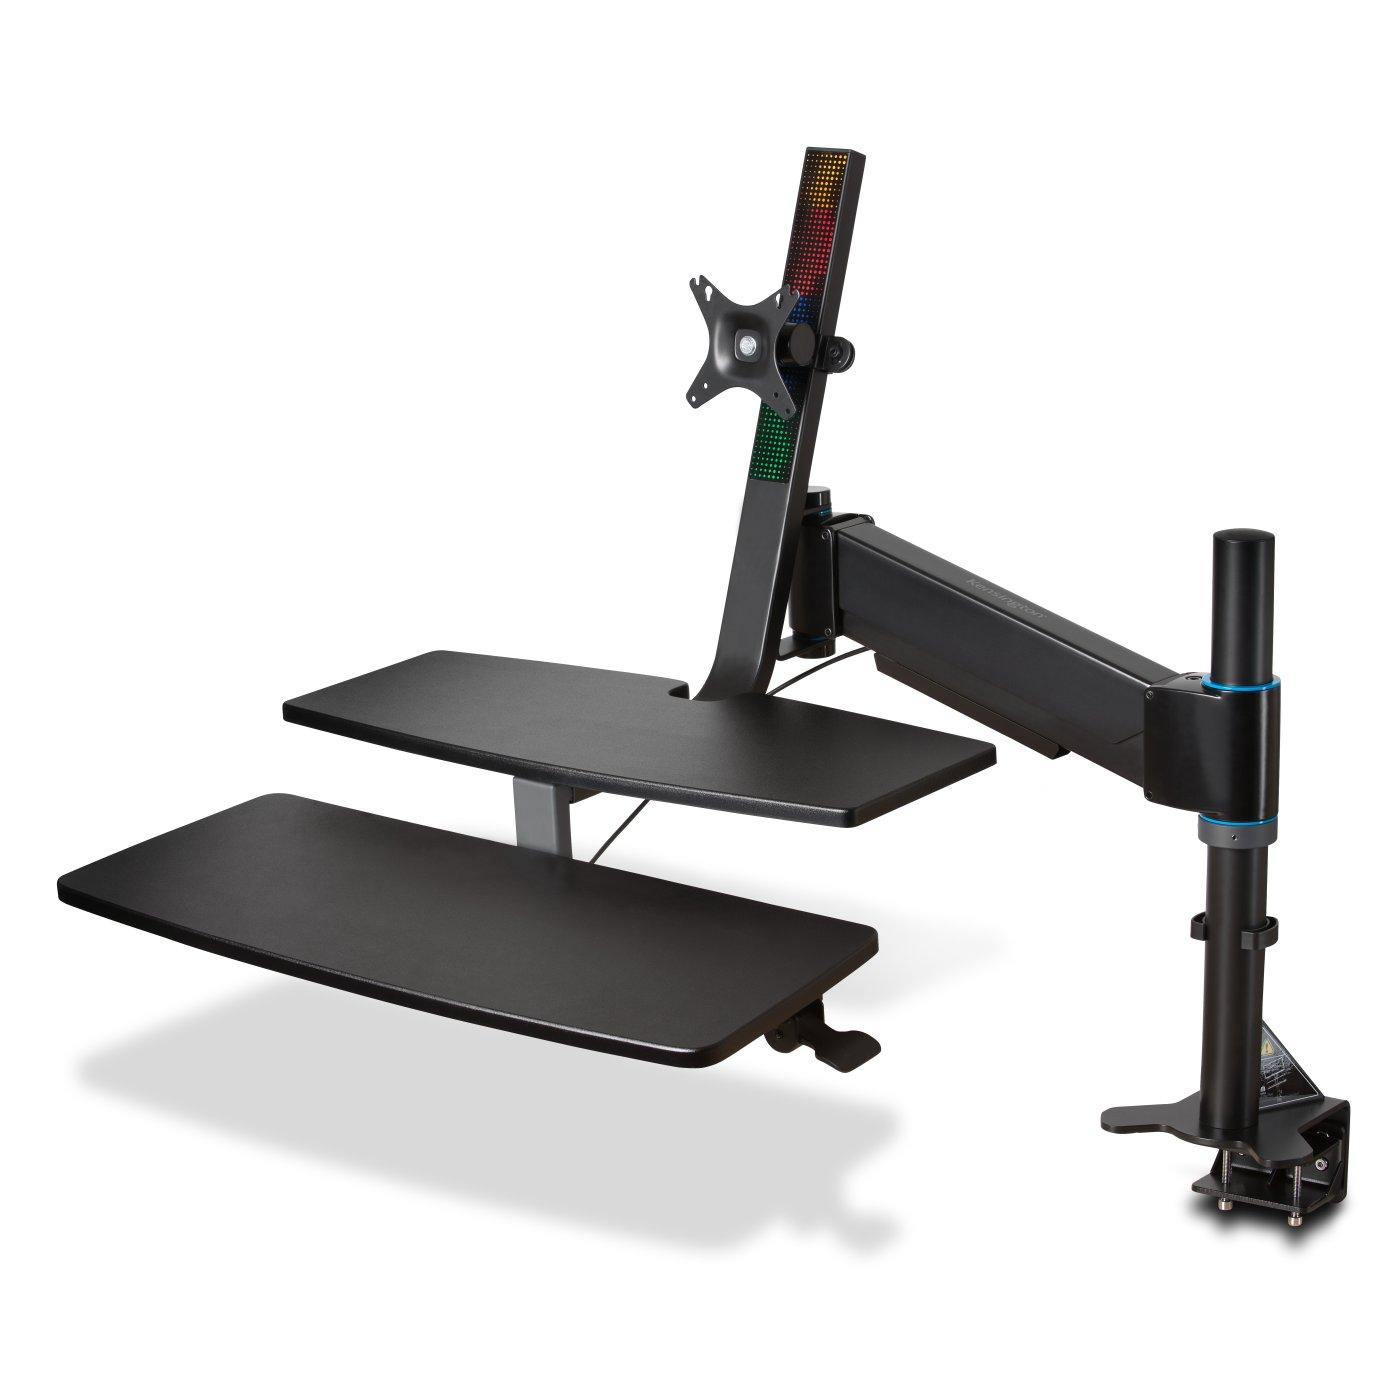 Kensington products ergonomics standing desk solutions smartfit sit stand workstation